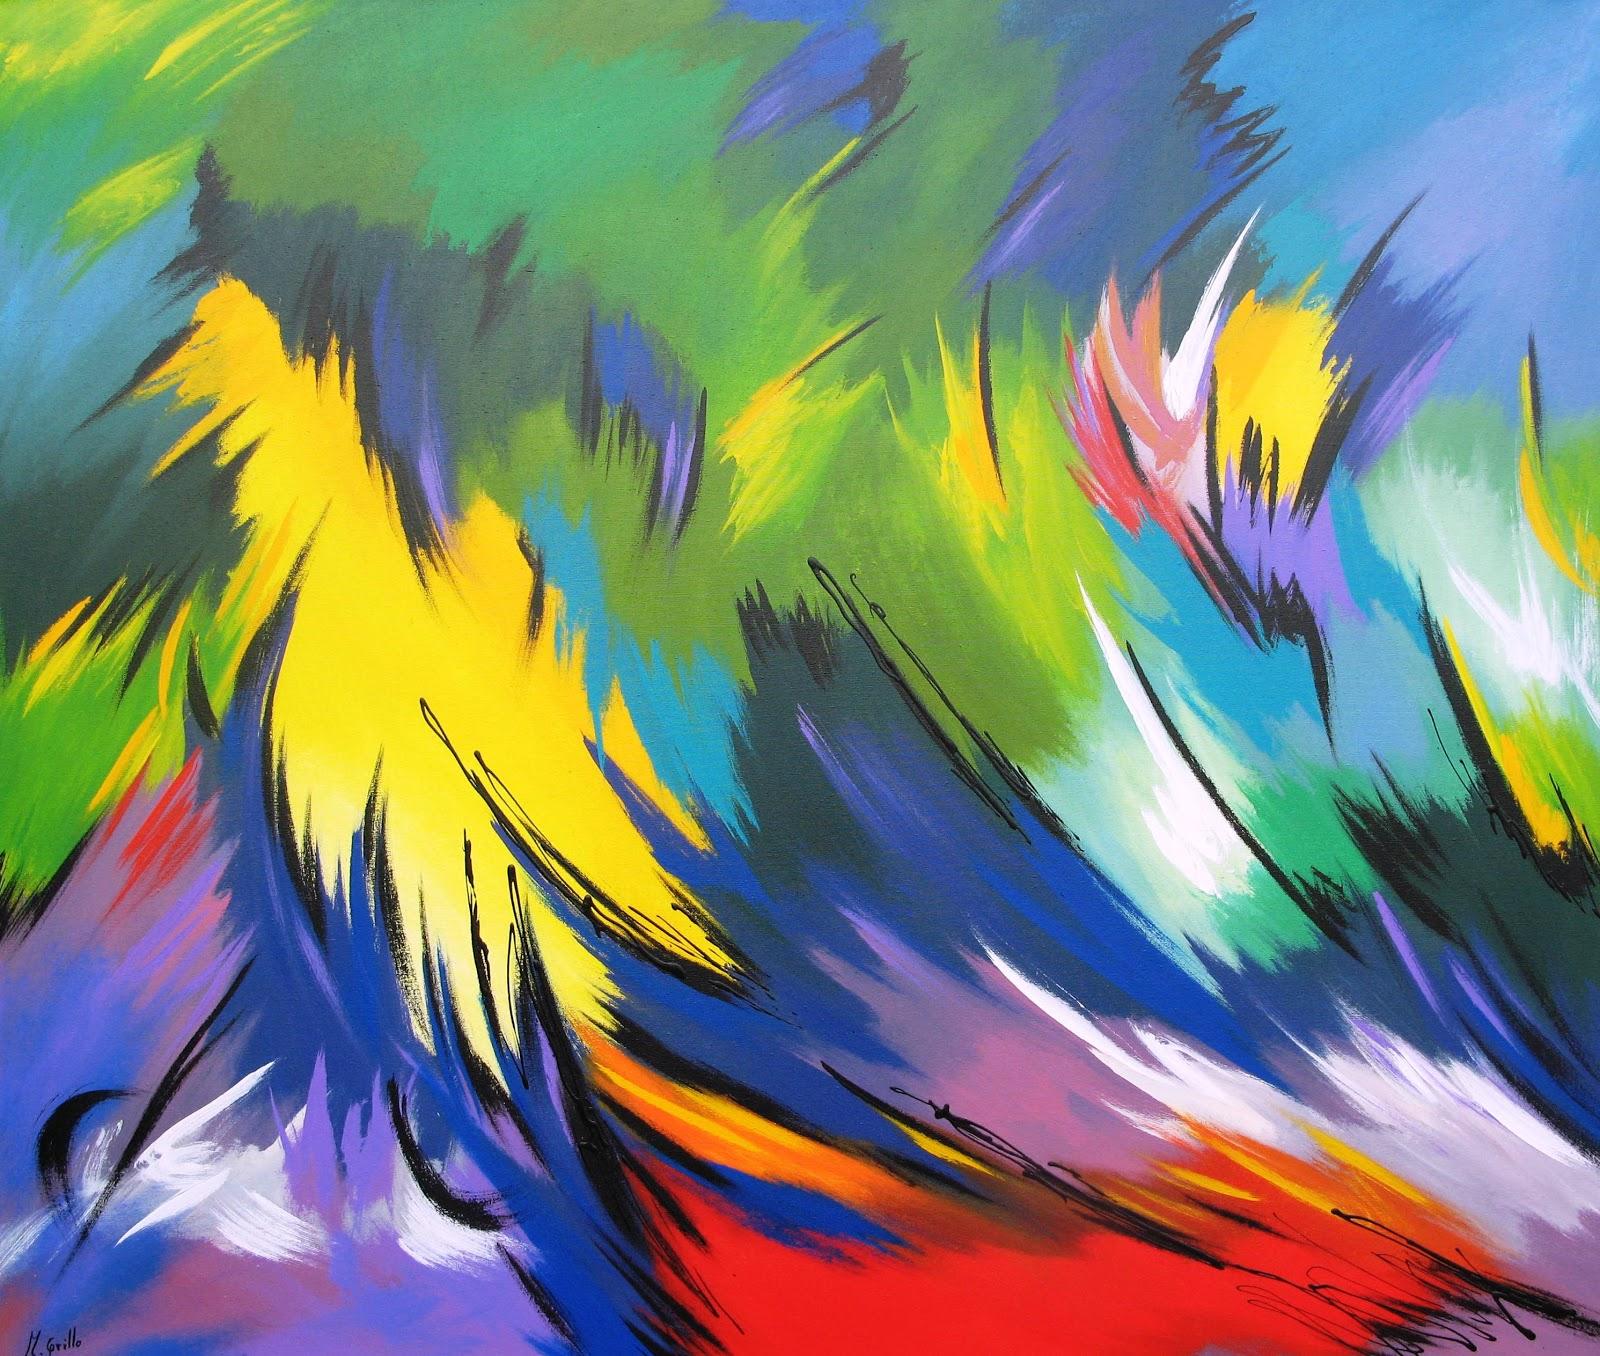 Im genes arte pinturas pinturas abstractos modernos for Fotos de cuadros abstracto